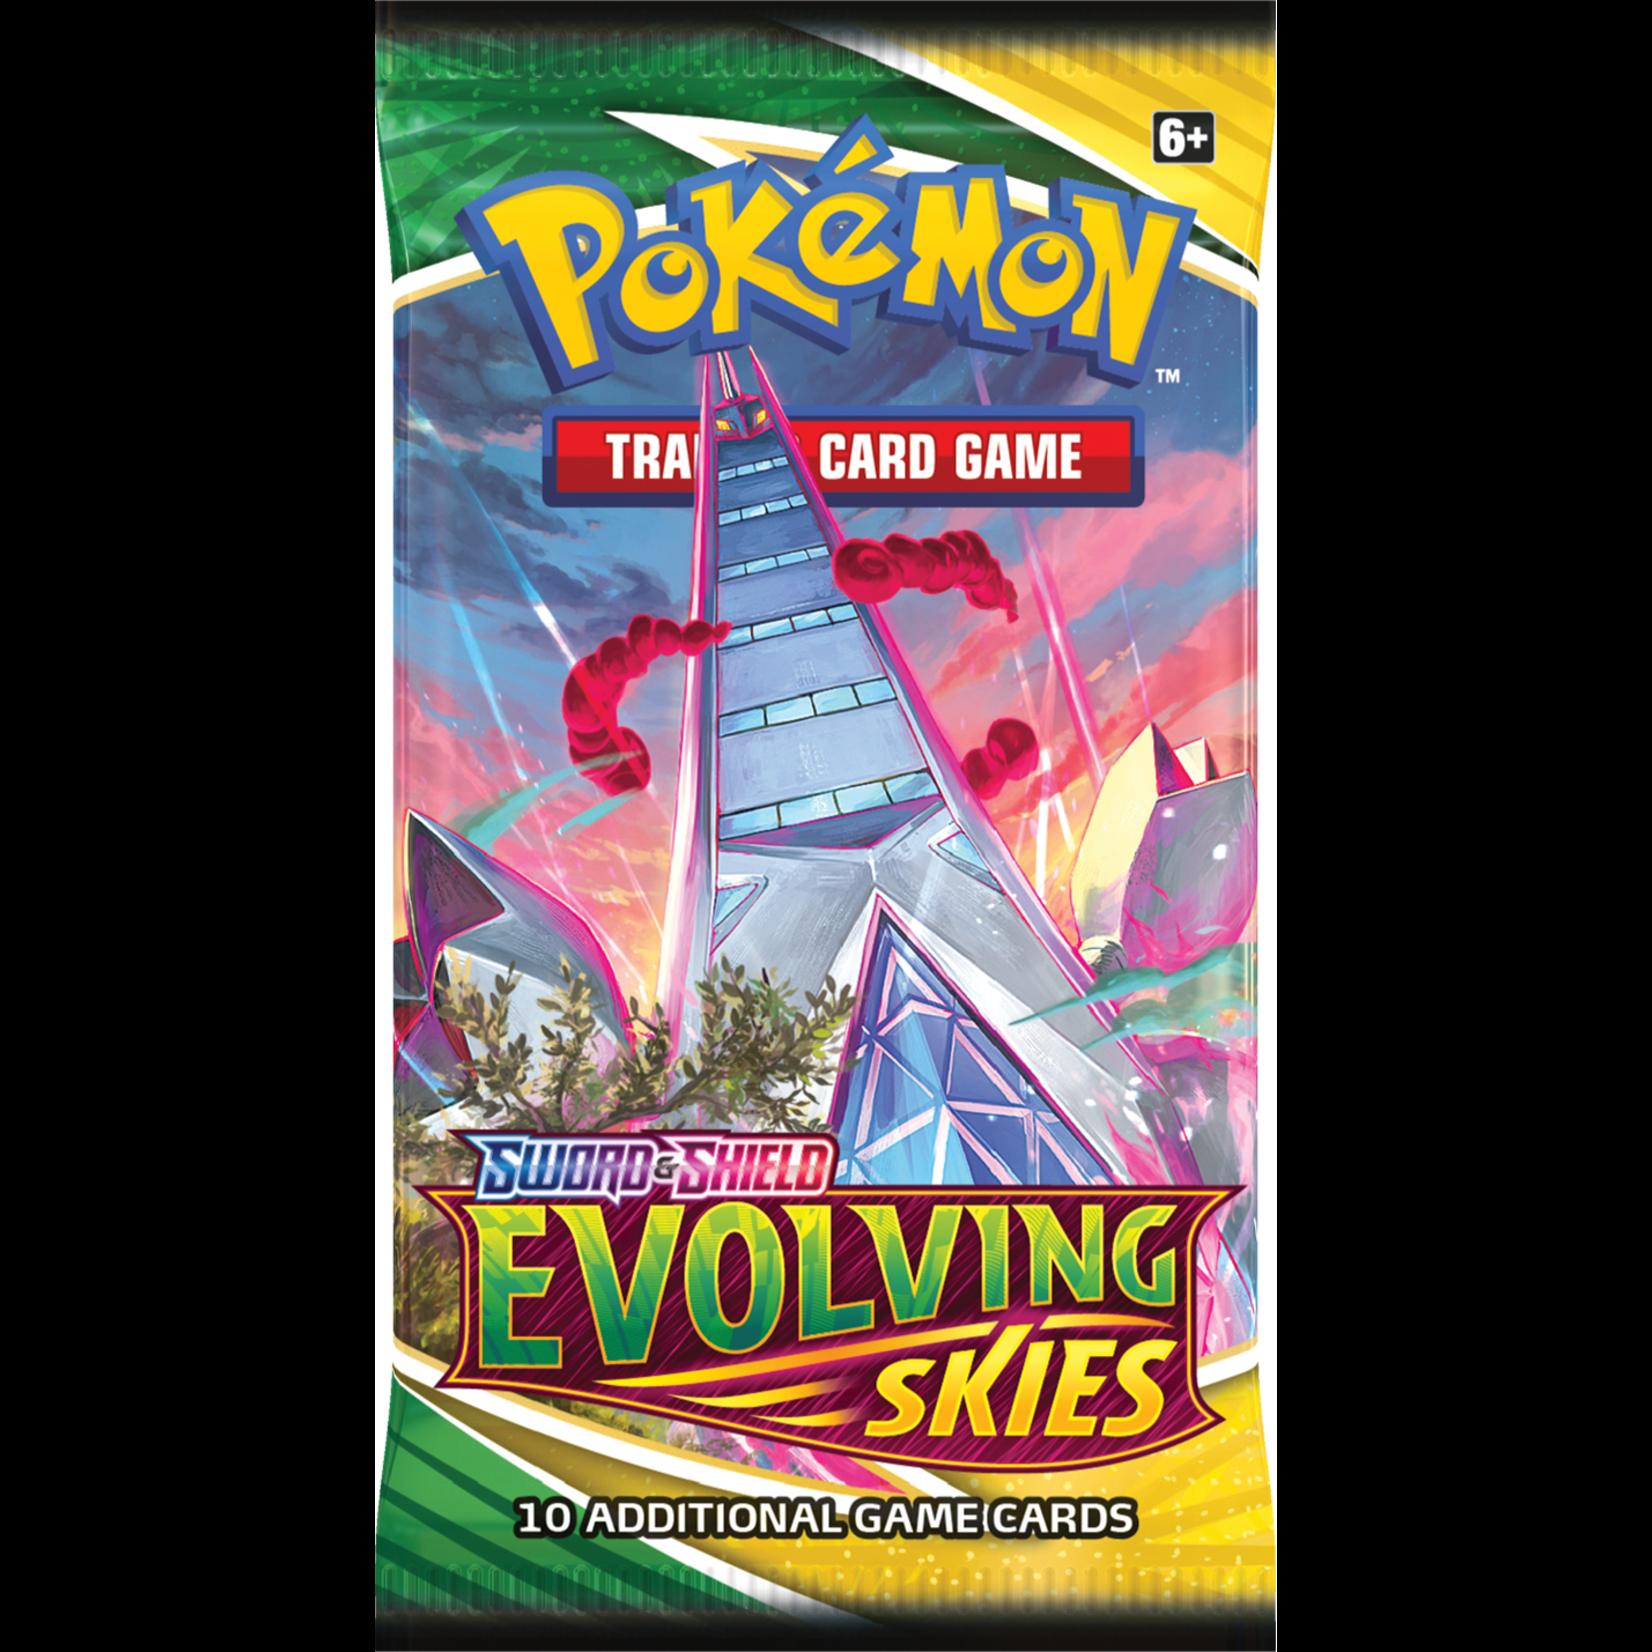 Pokémon Pokémon TCG: Sword & Shield—Evolving Skies Booster Pack